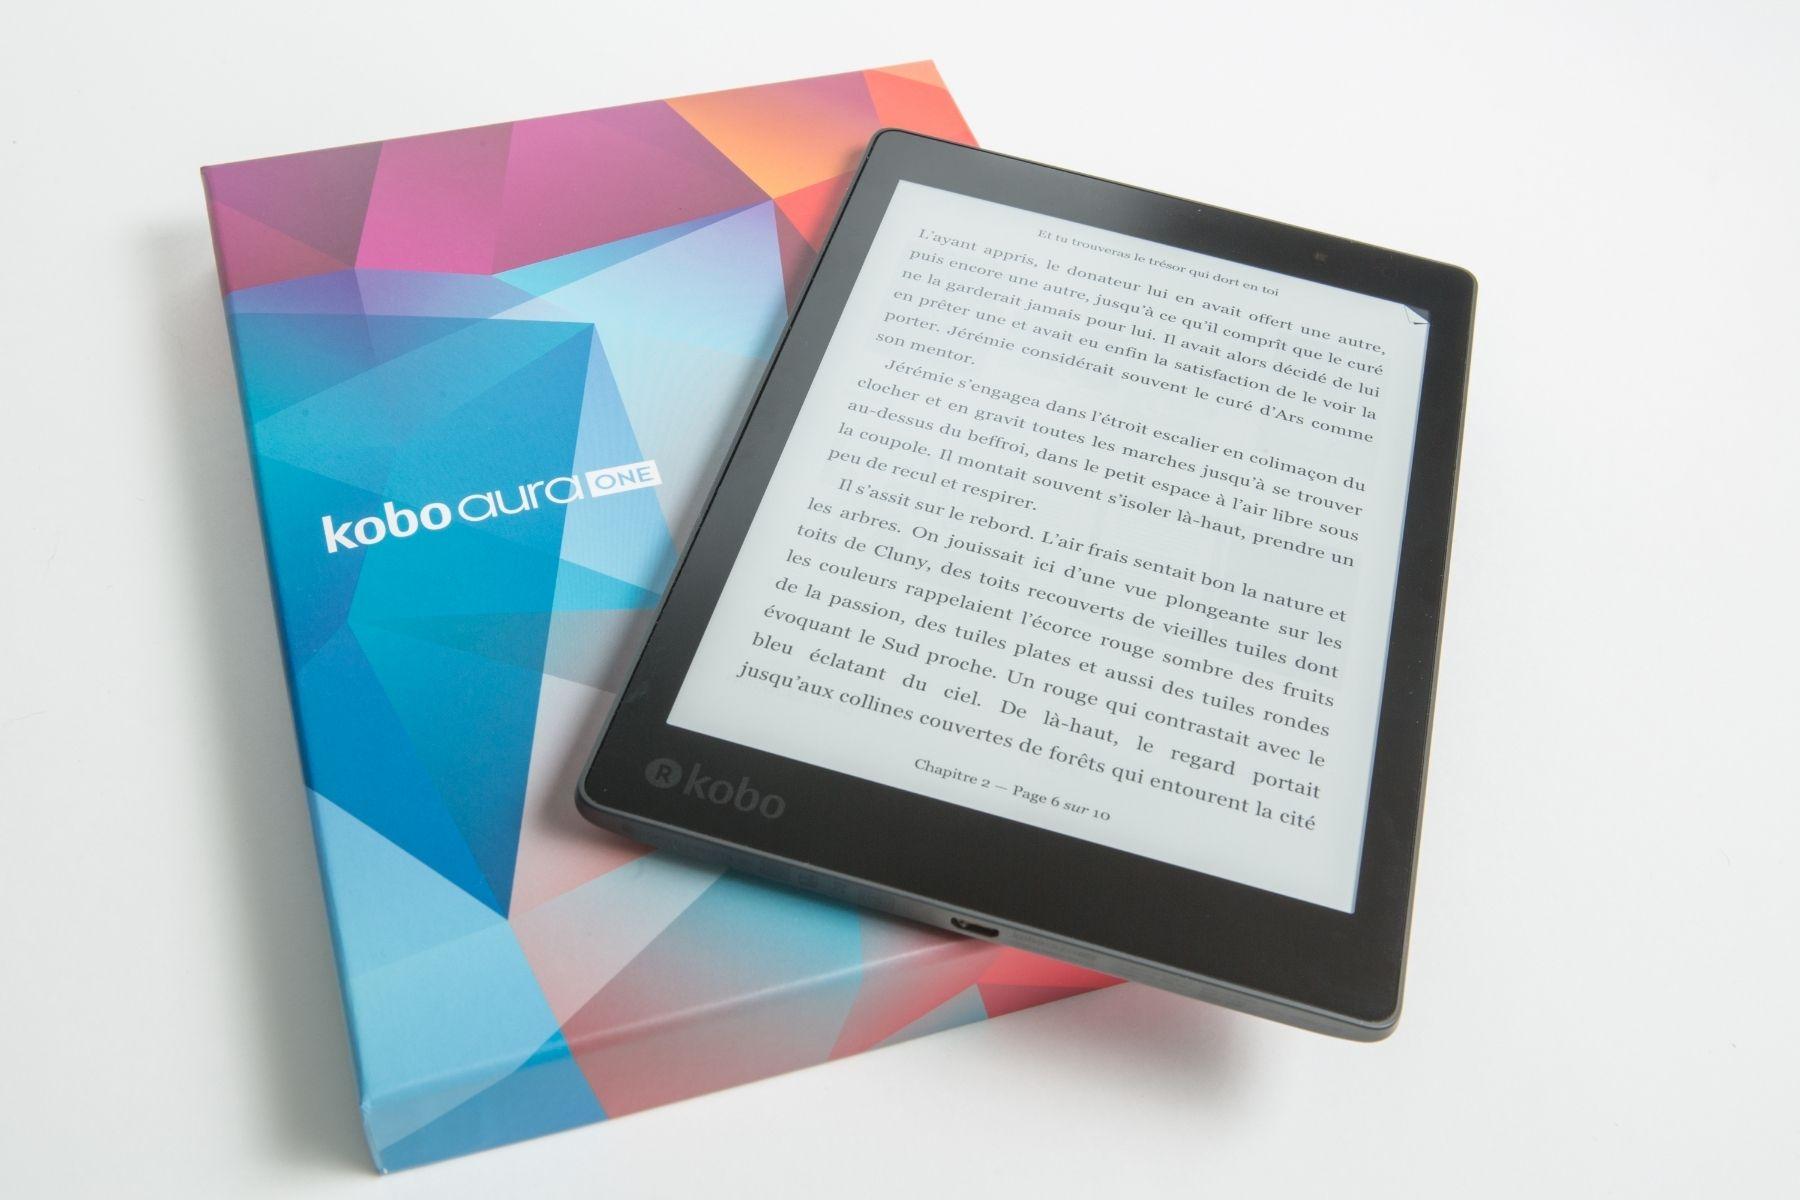 vender ebooks